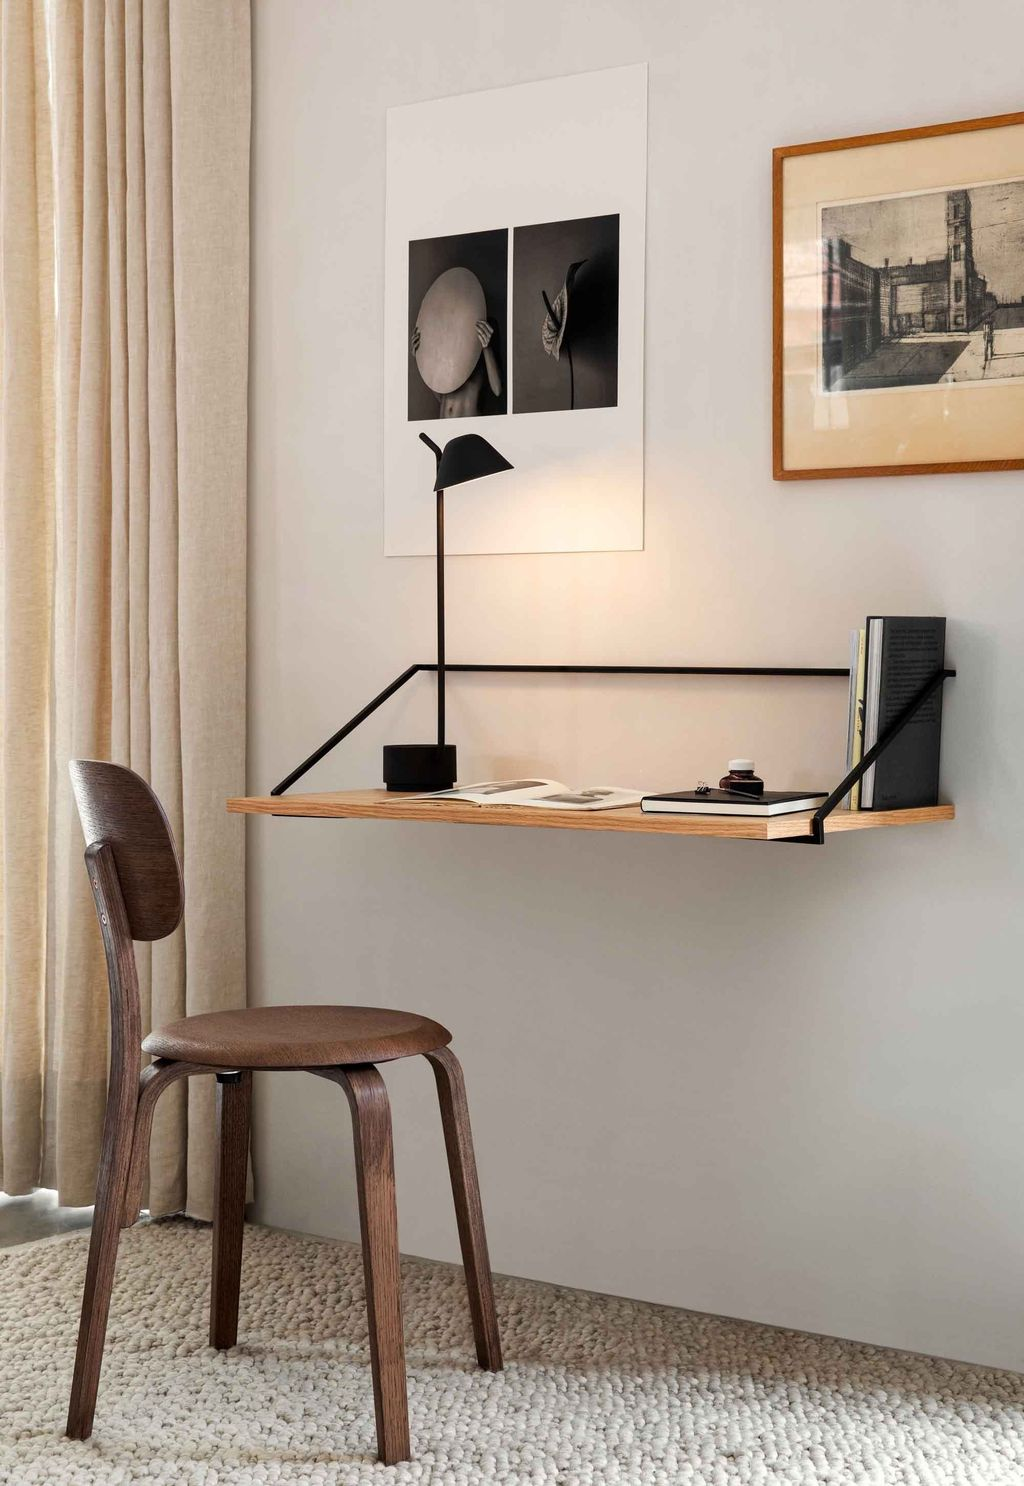 Admirable Minimalist Modern Furniture Design Ideas 24